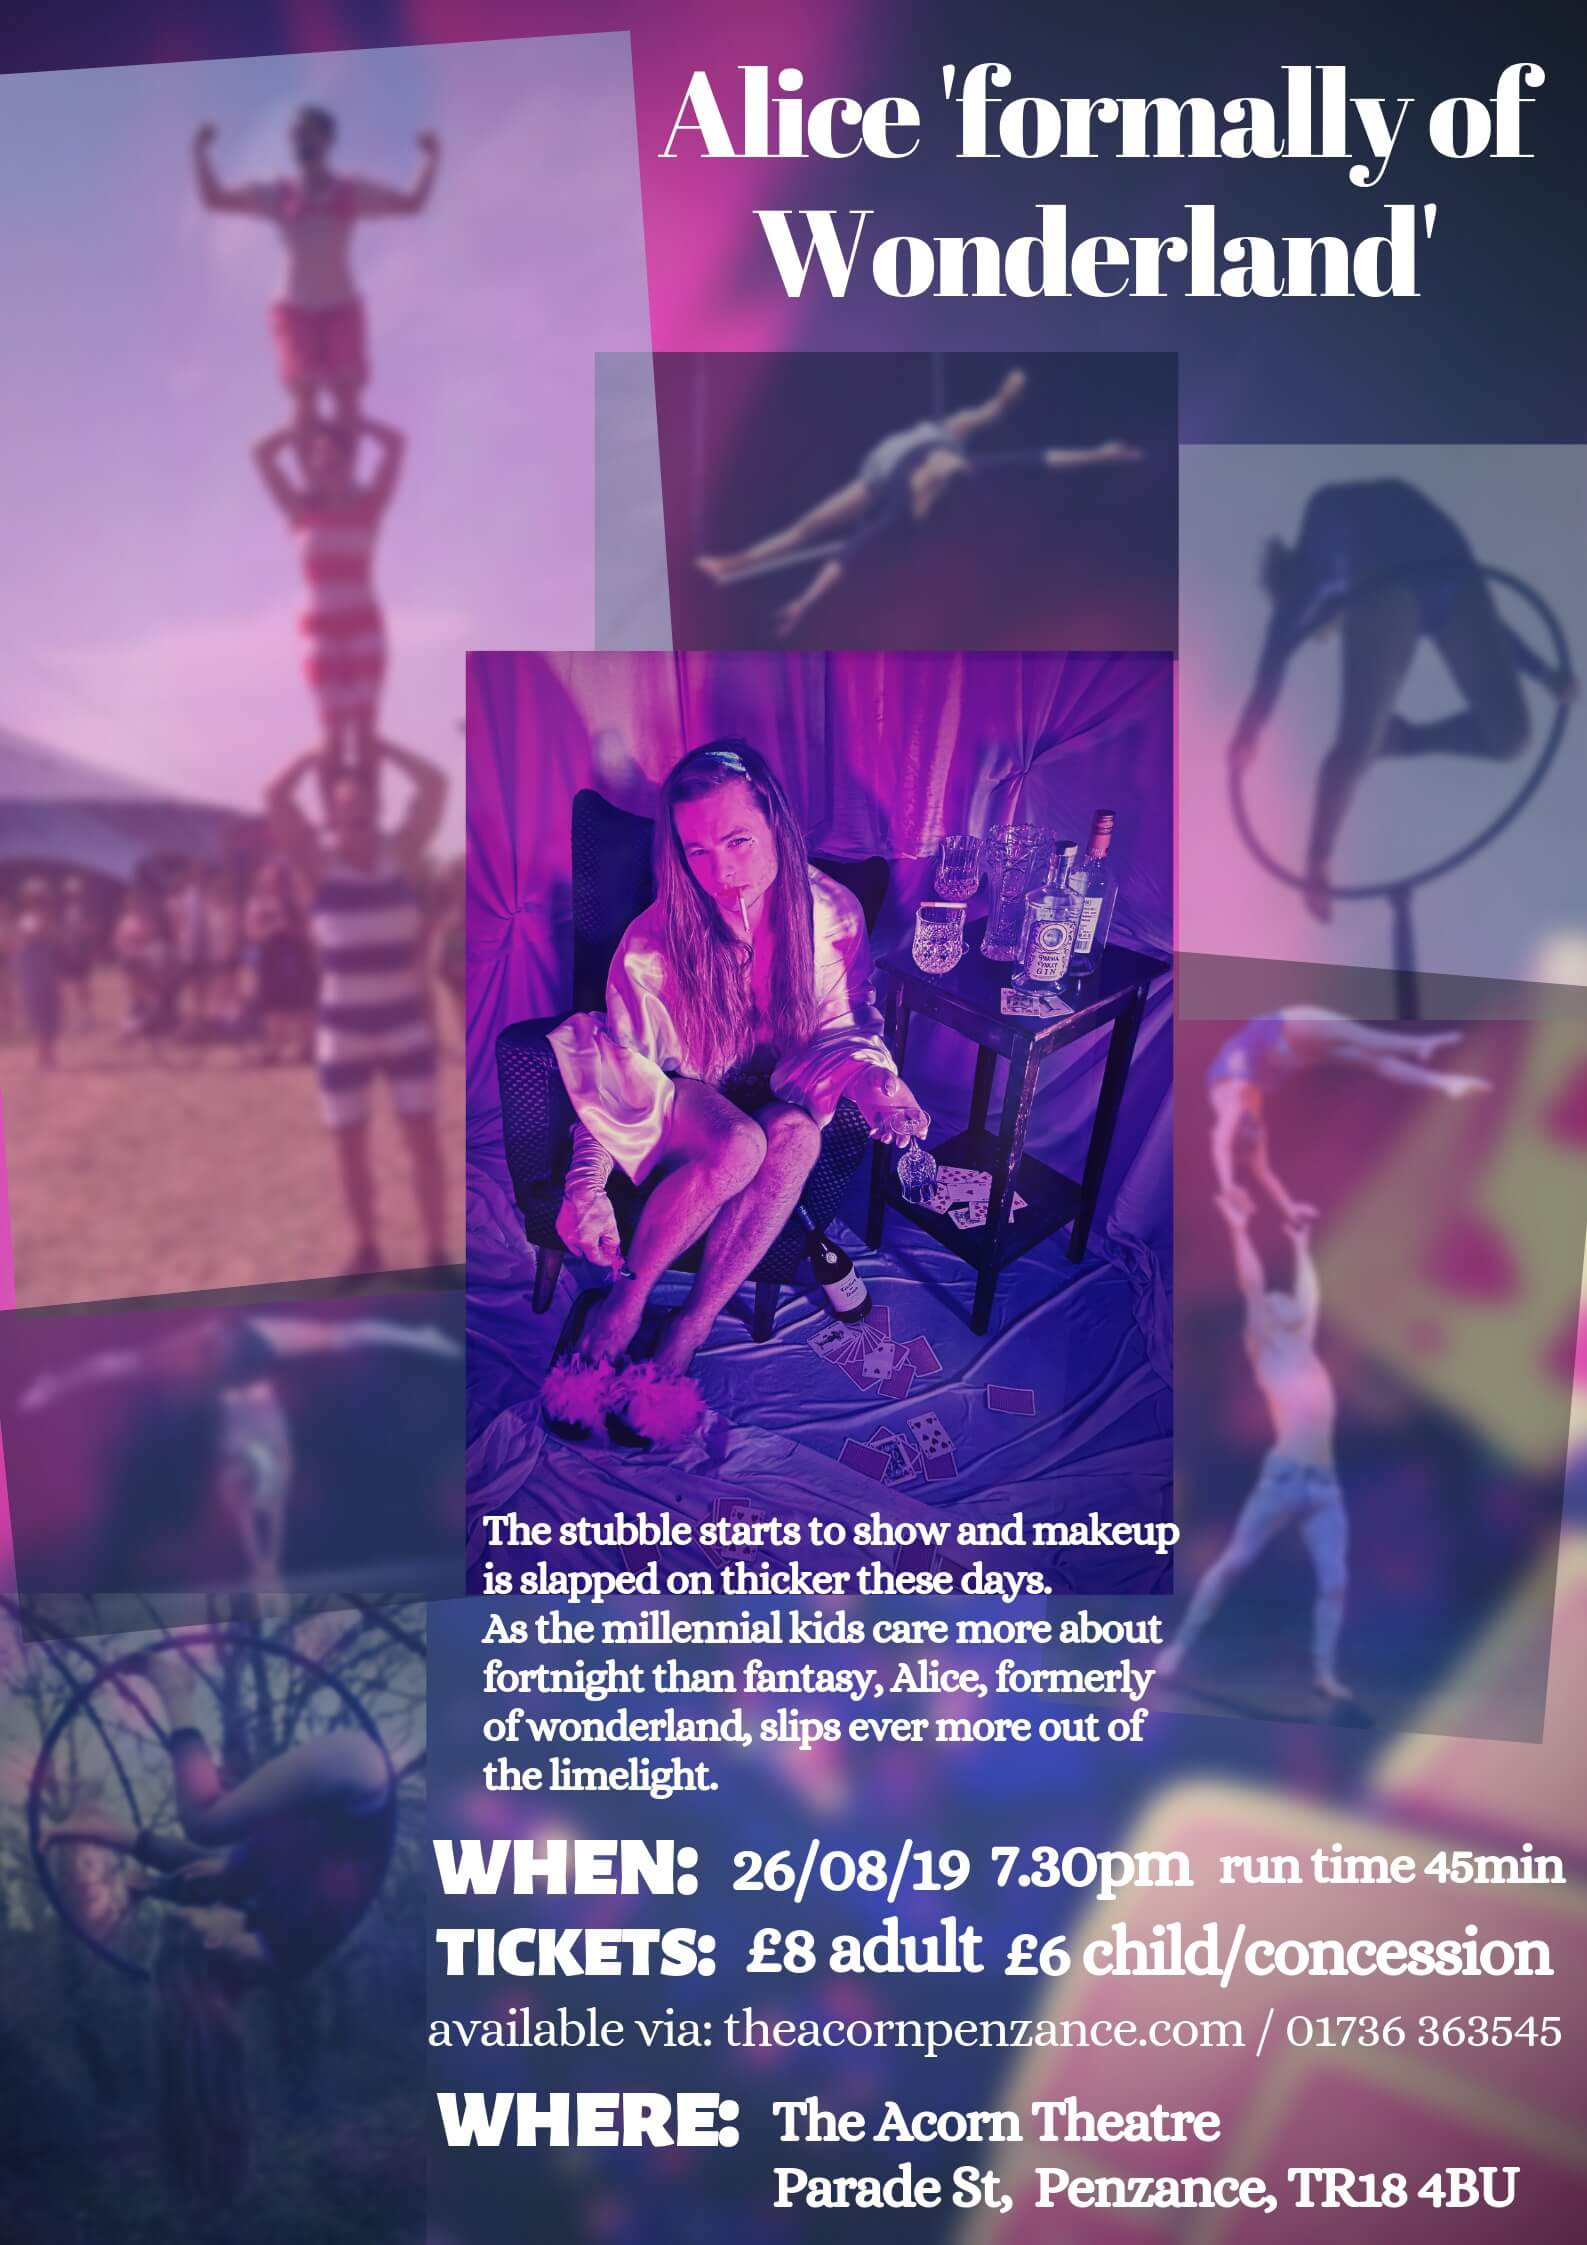 Pokya Entertainment Presents :Alice formerly of Wonderland: